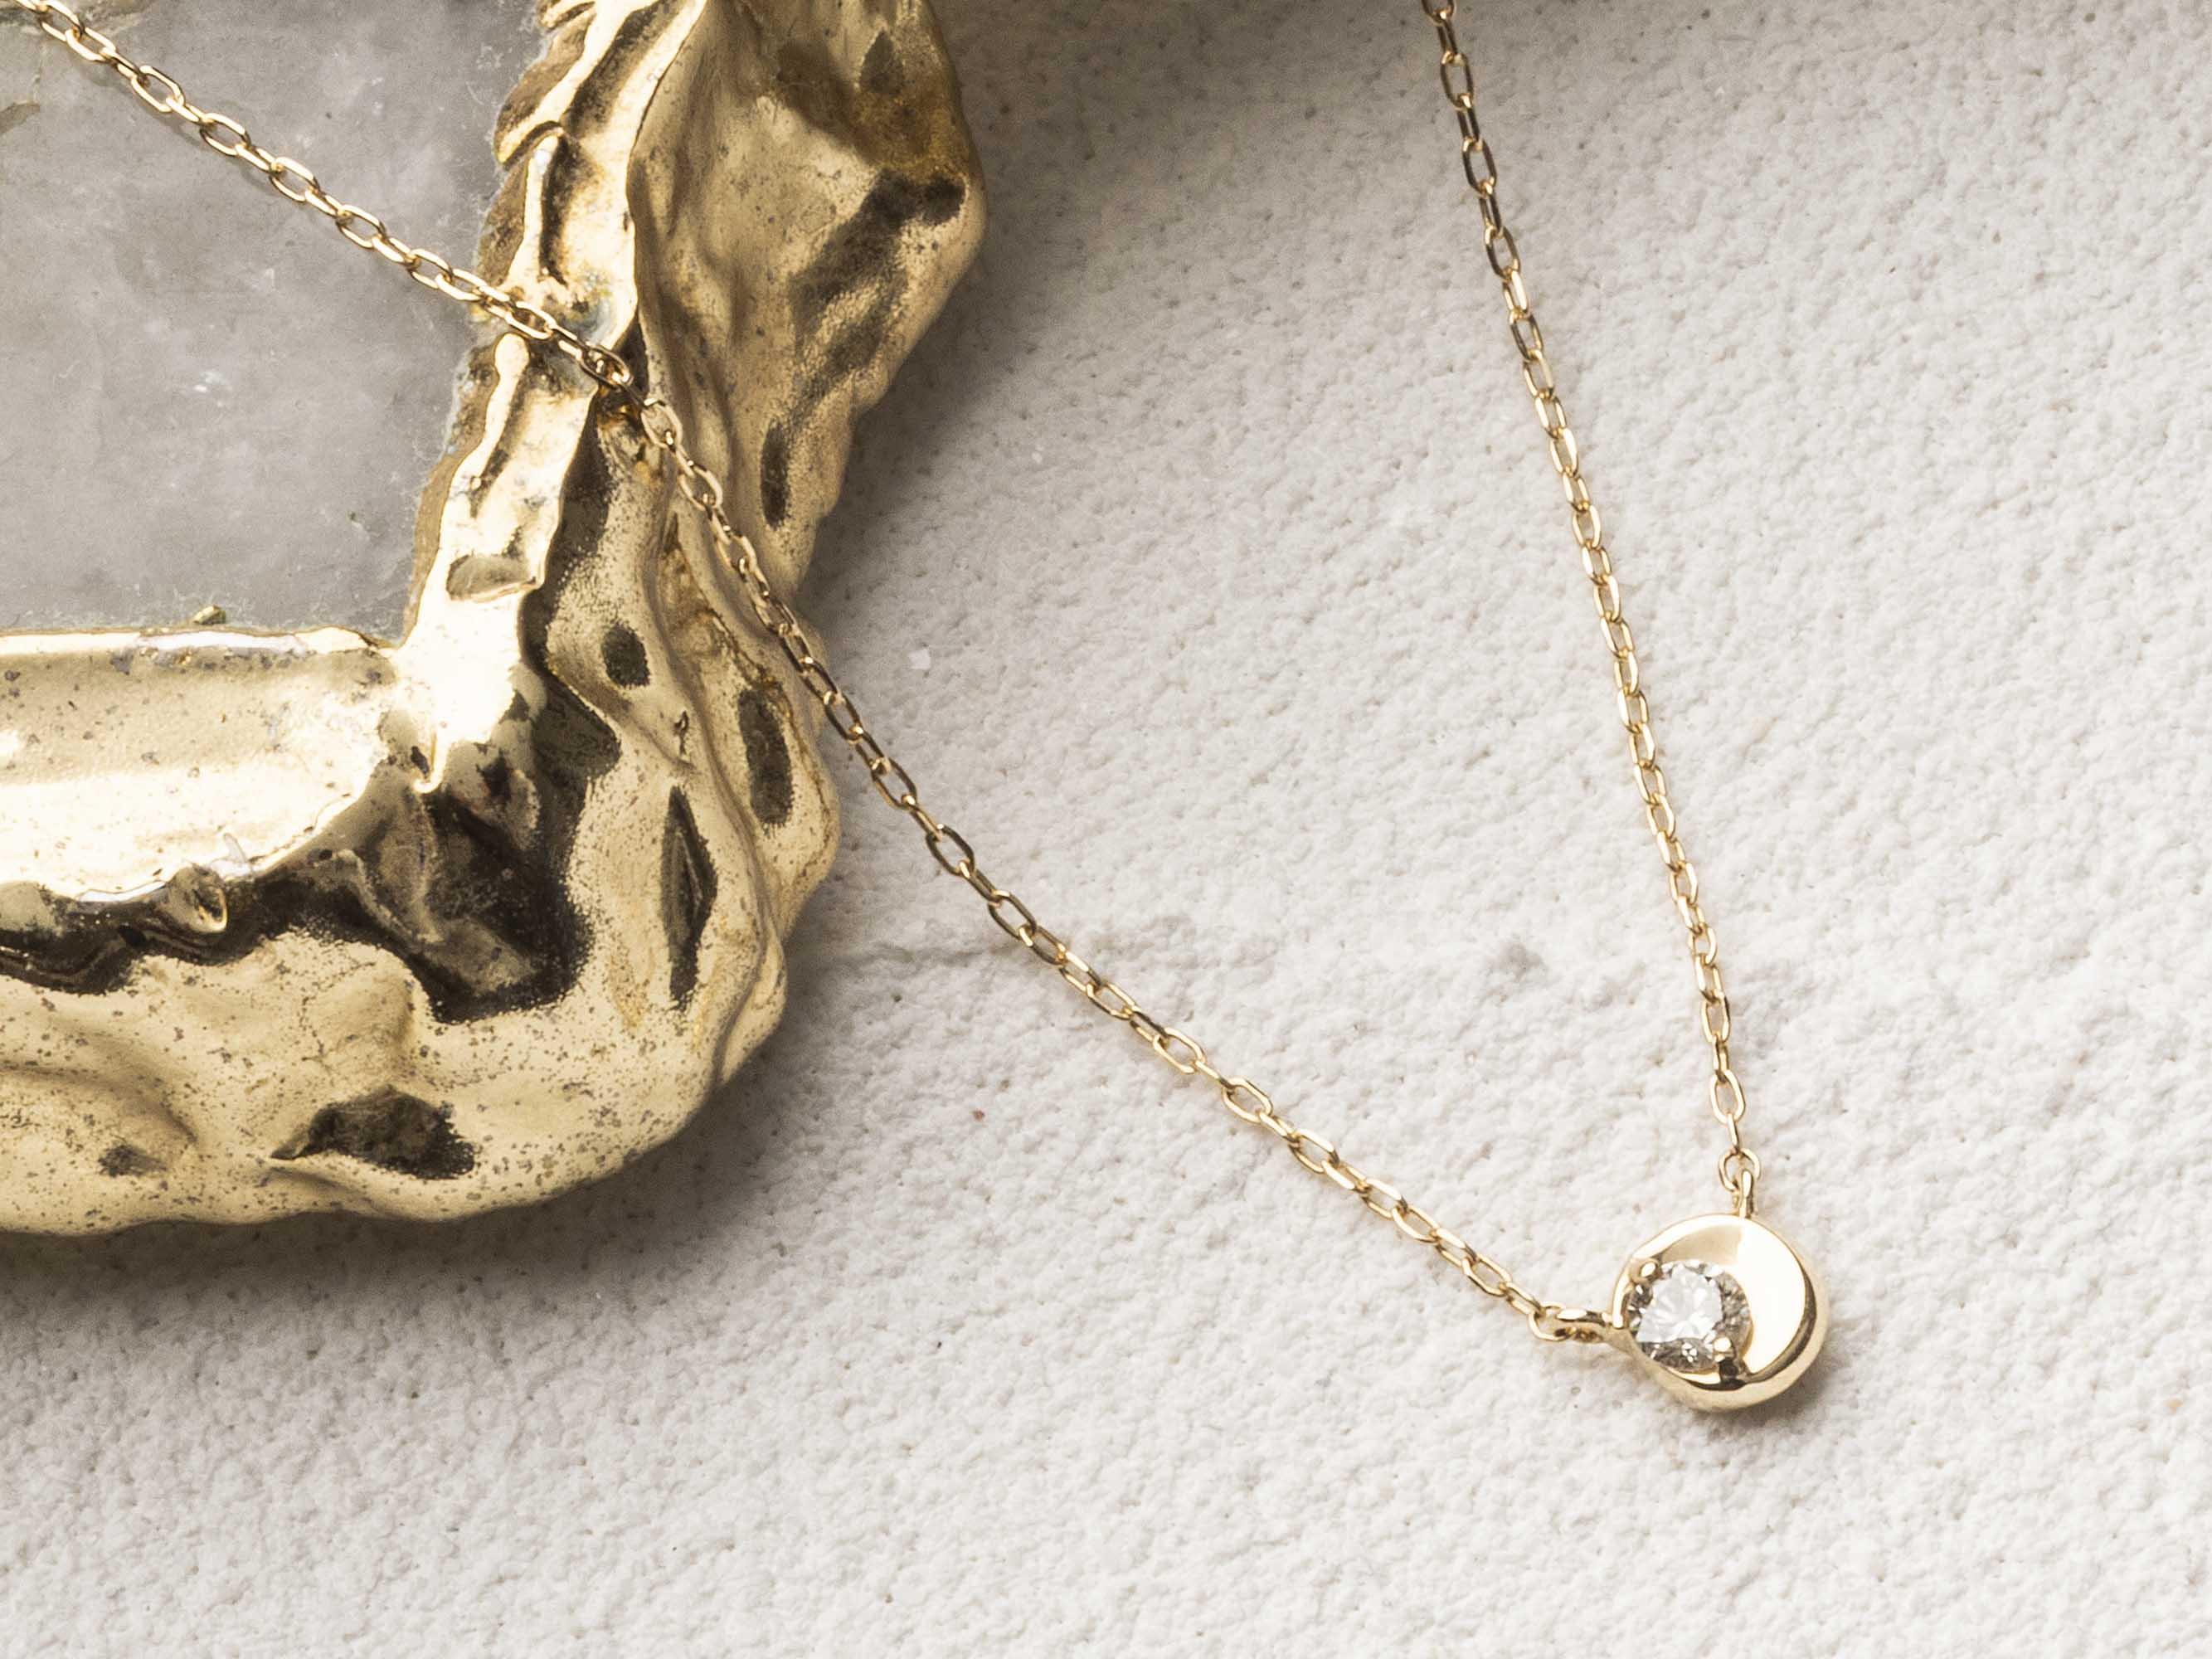 MOON モチーフダイヤモンドネックレス K10 YG - IRIE JEWELRY